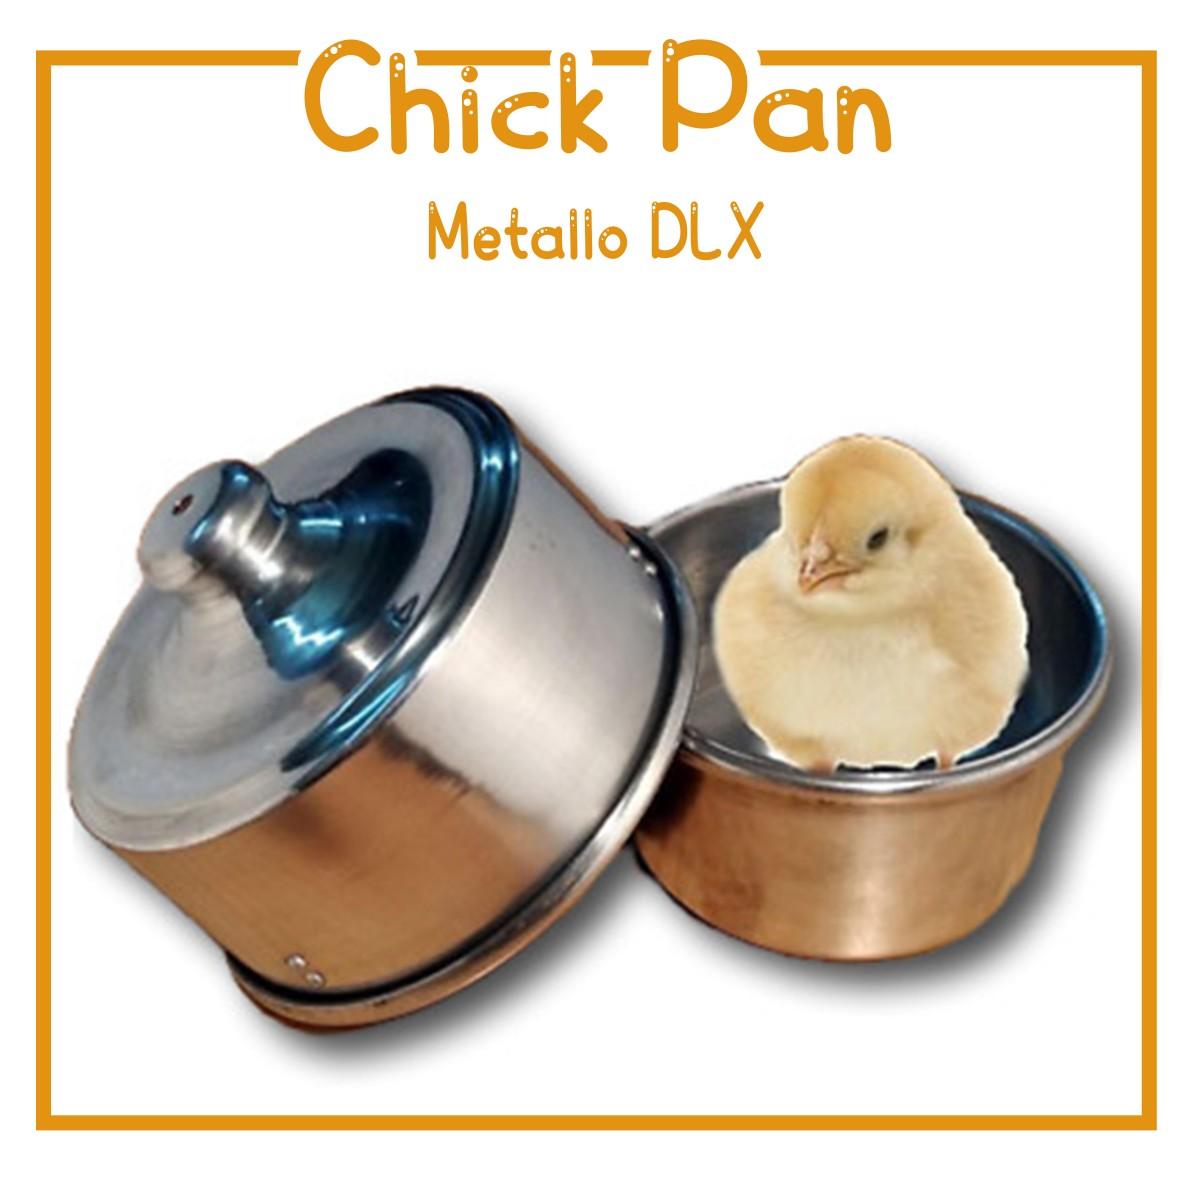 Chick pan  - candy pan metallo dlx